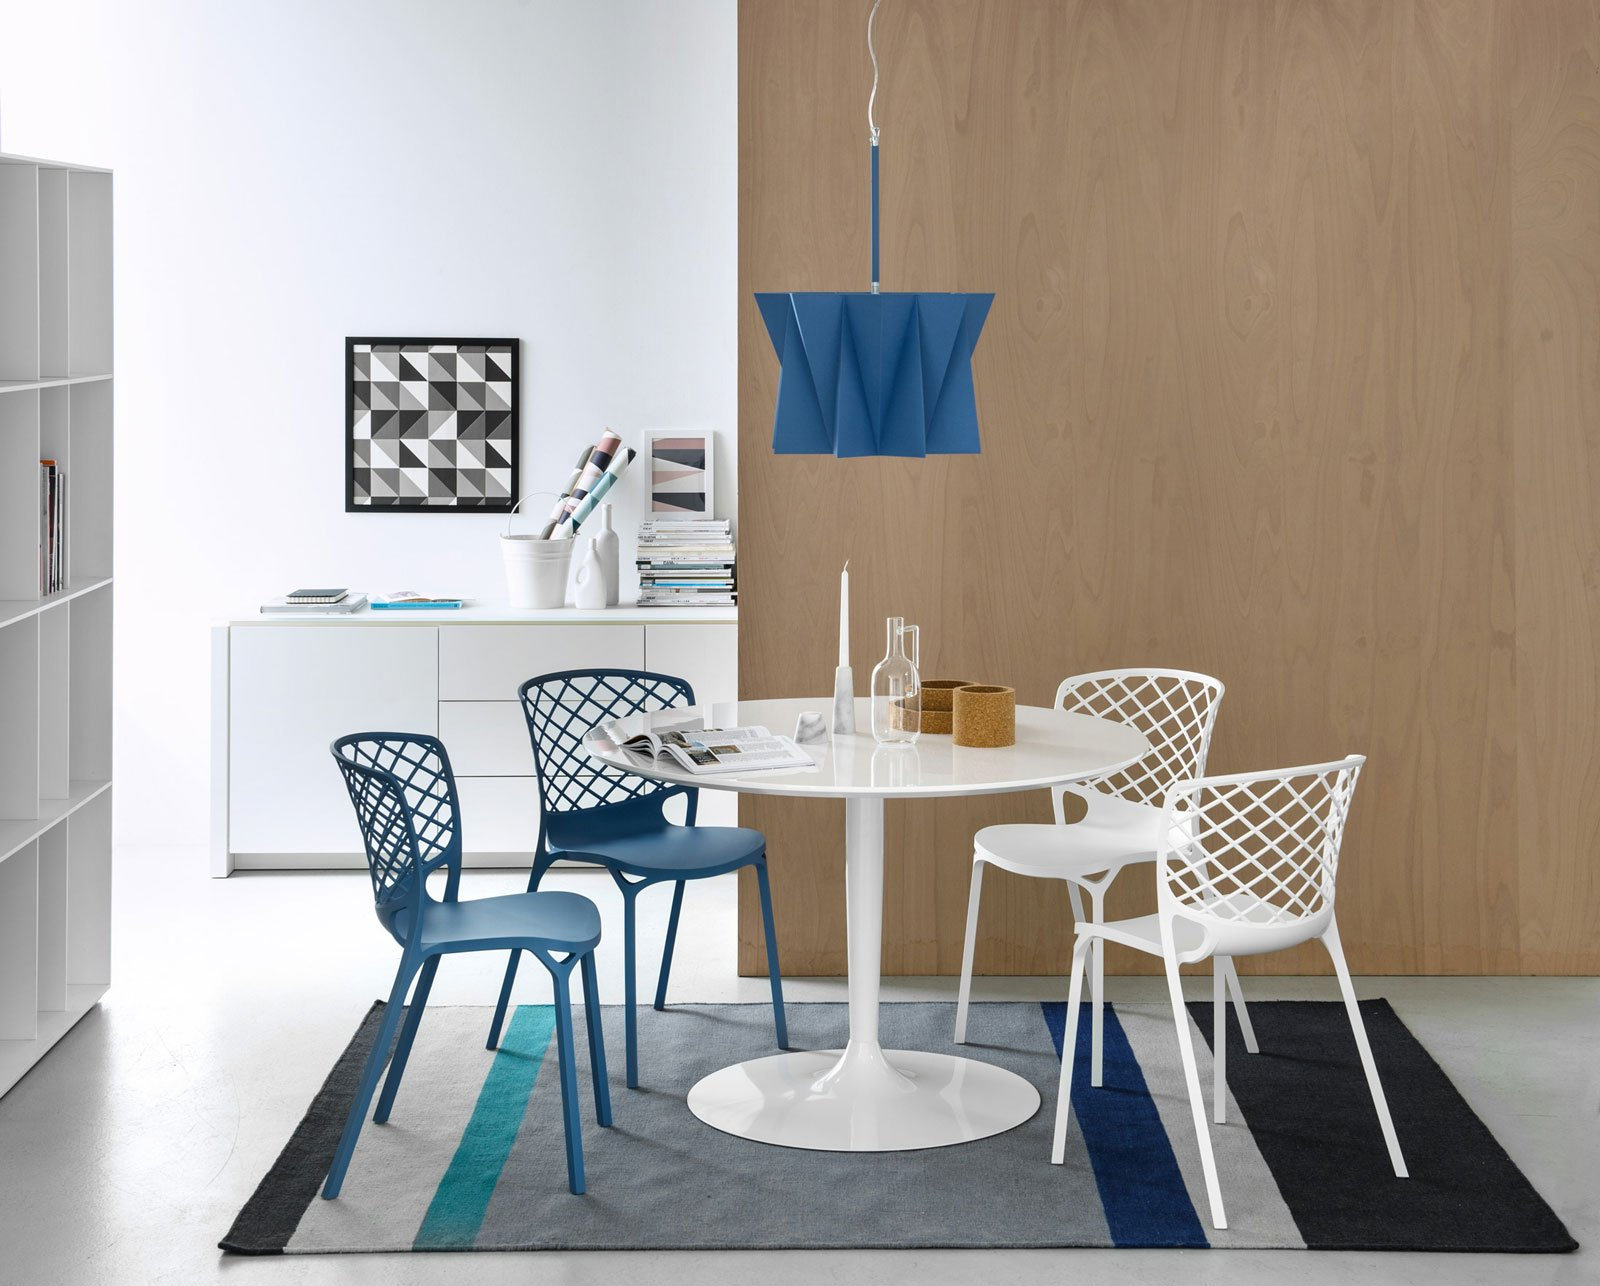 1 calligaris tavolo planet sedie gamera bianche e blu cose di casa - Tavolo eclisse calligaris ...